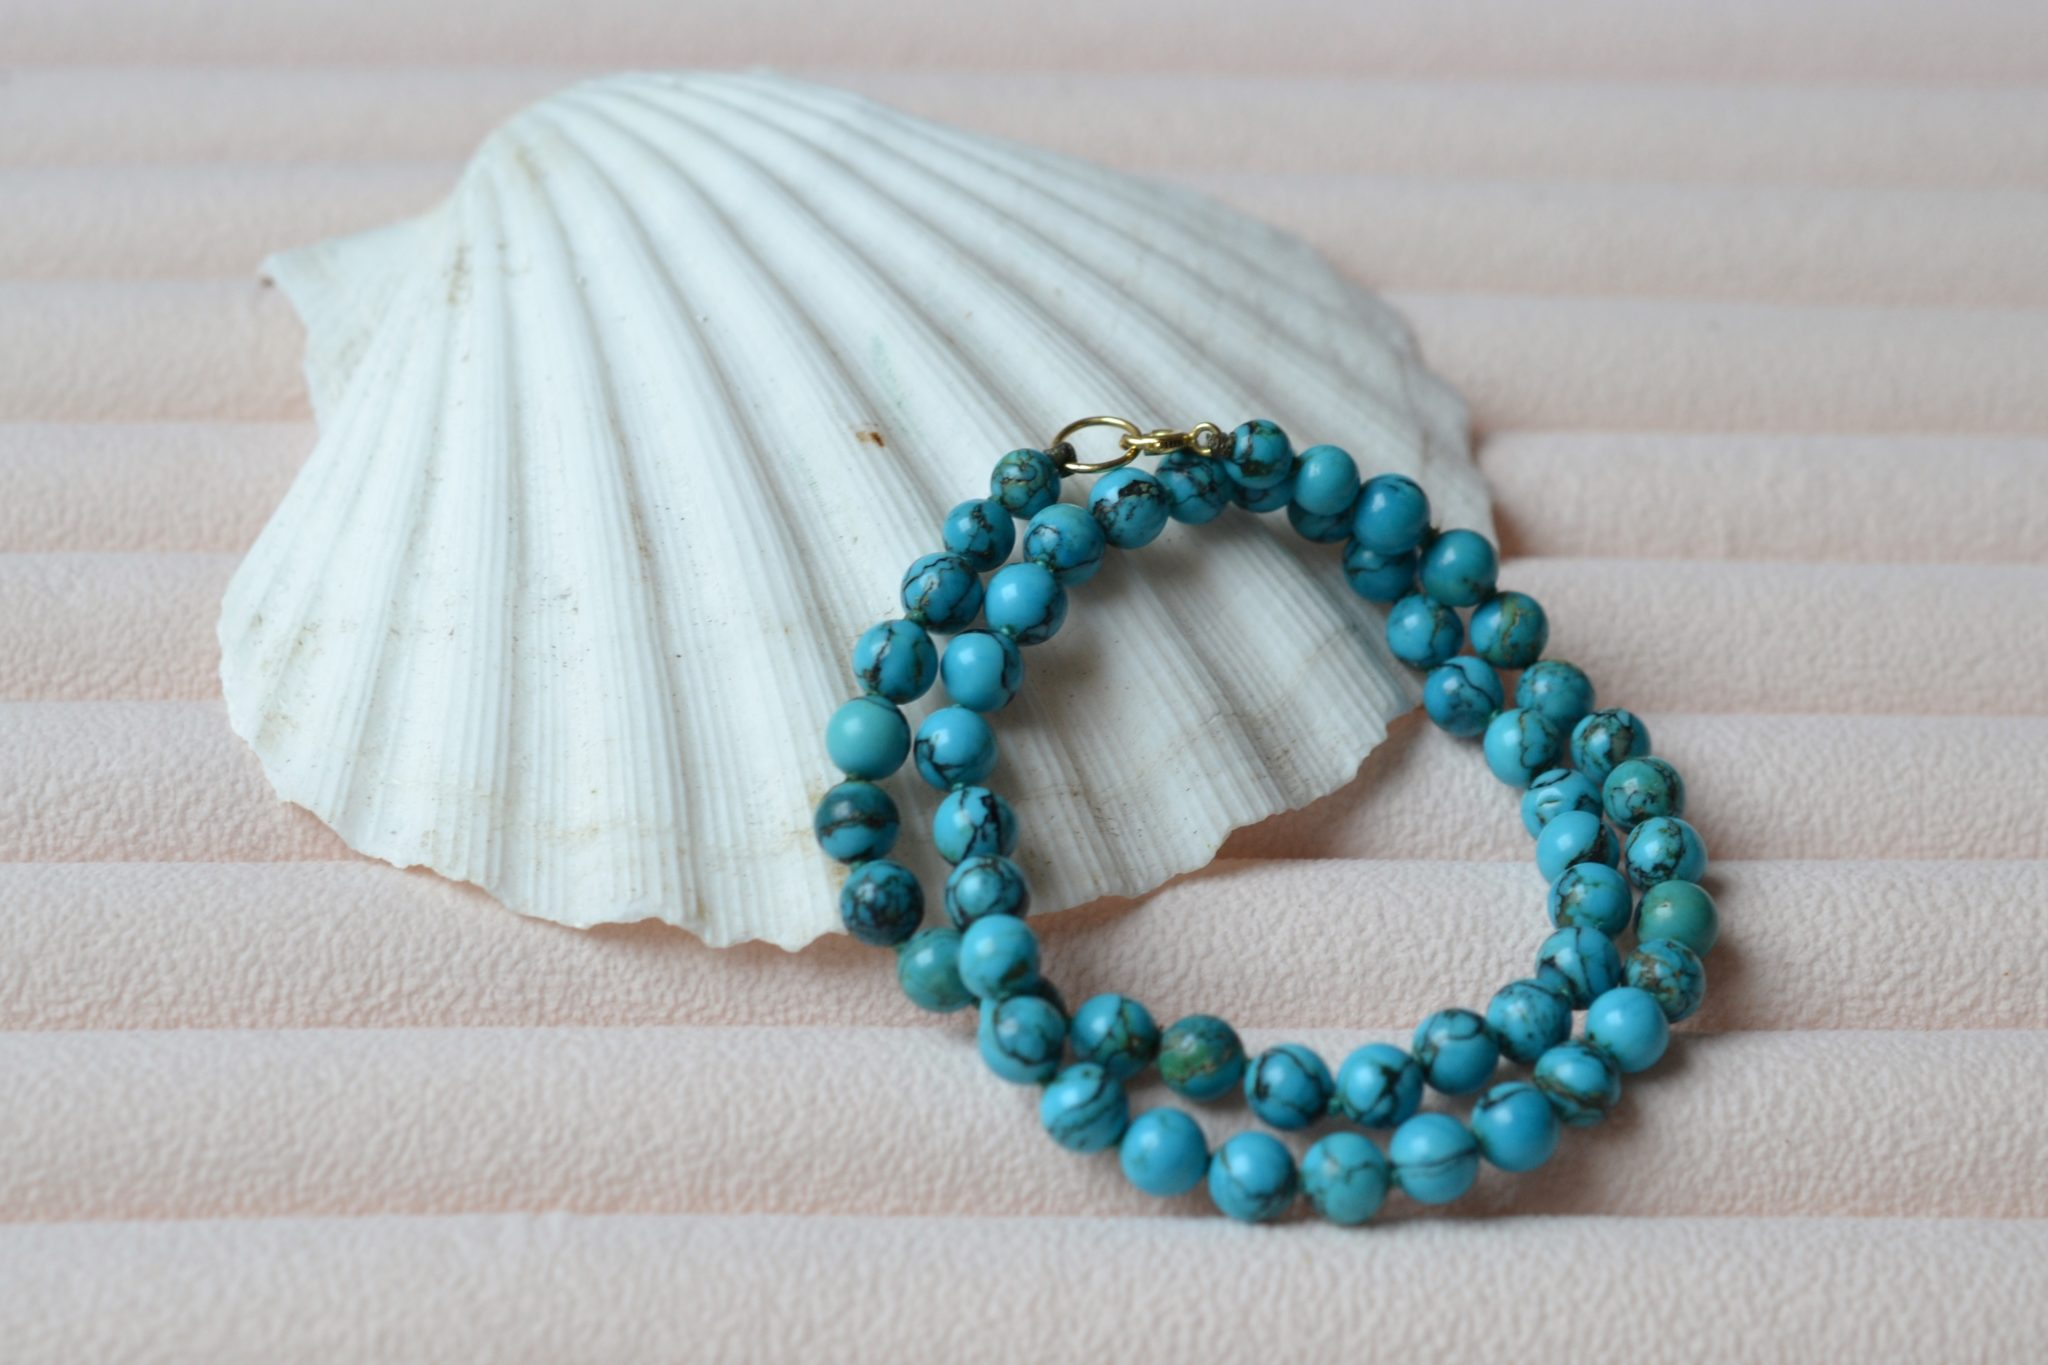 Collier-perles-de-turquoise-bijou-or-massif